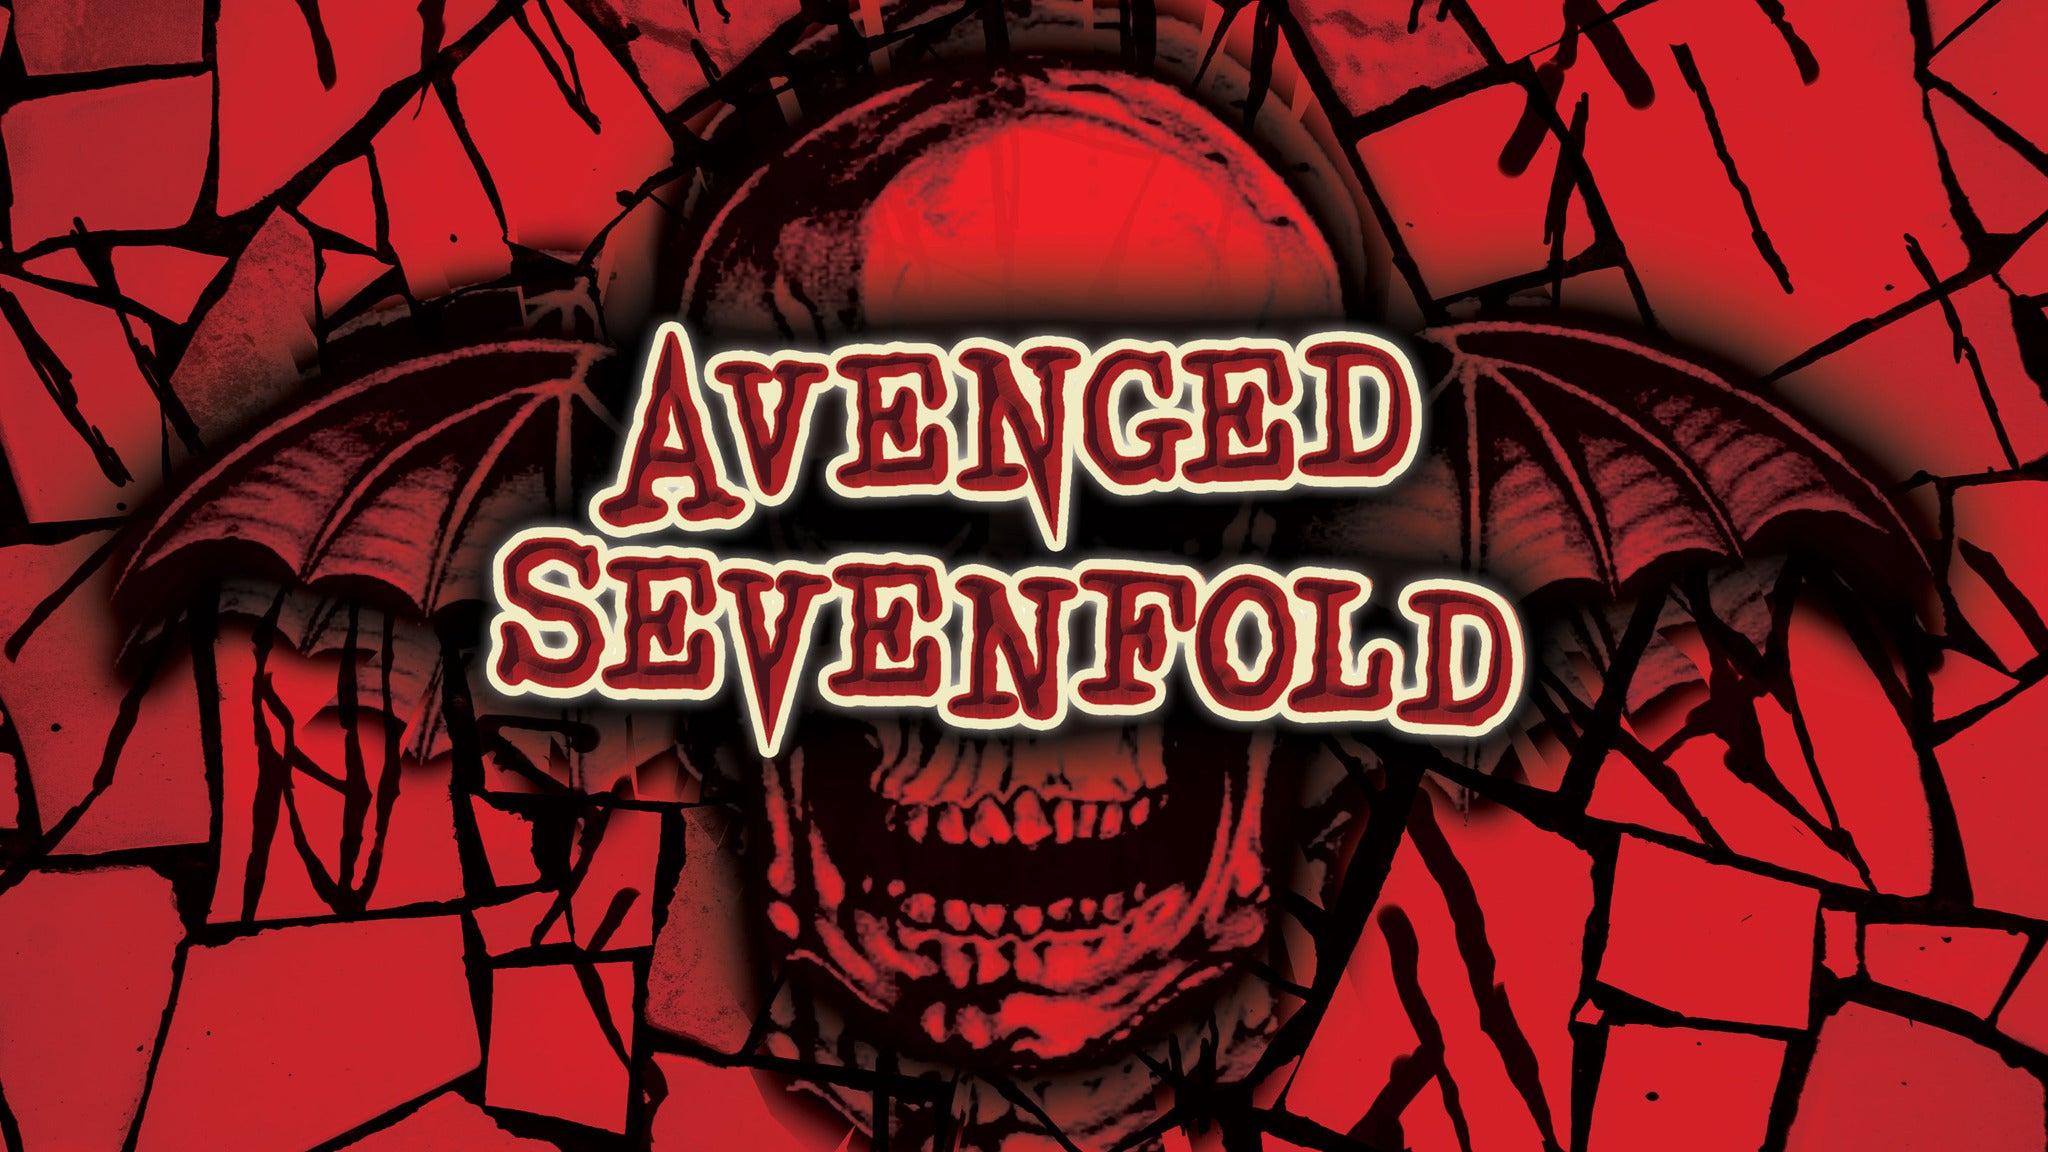 Avenged Sevenfold at Hard Rock Live